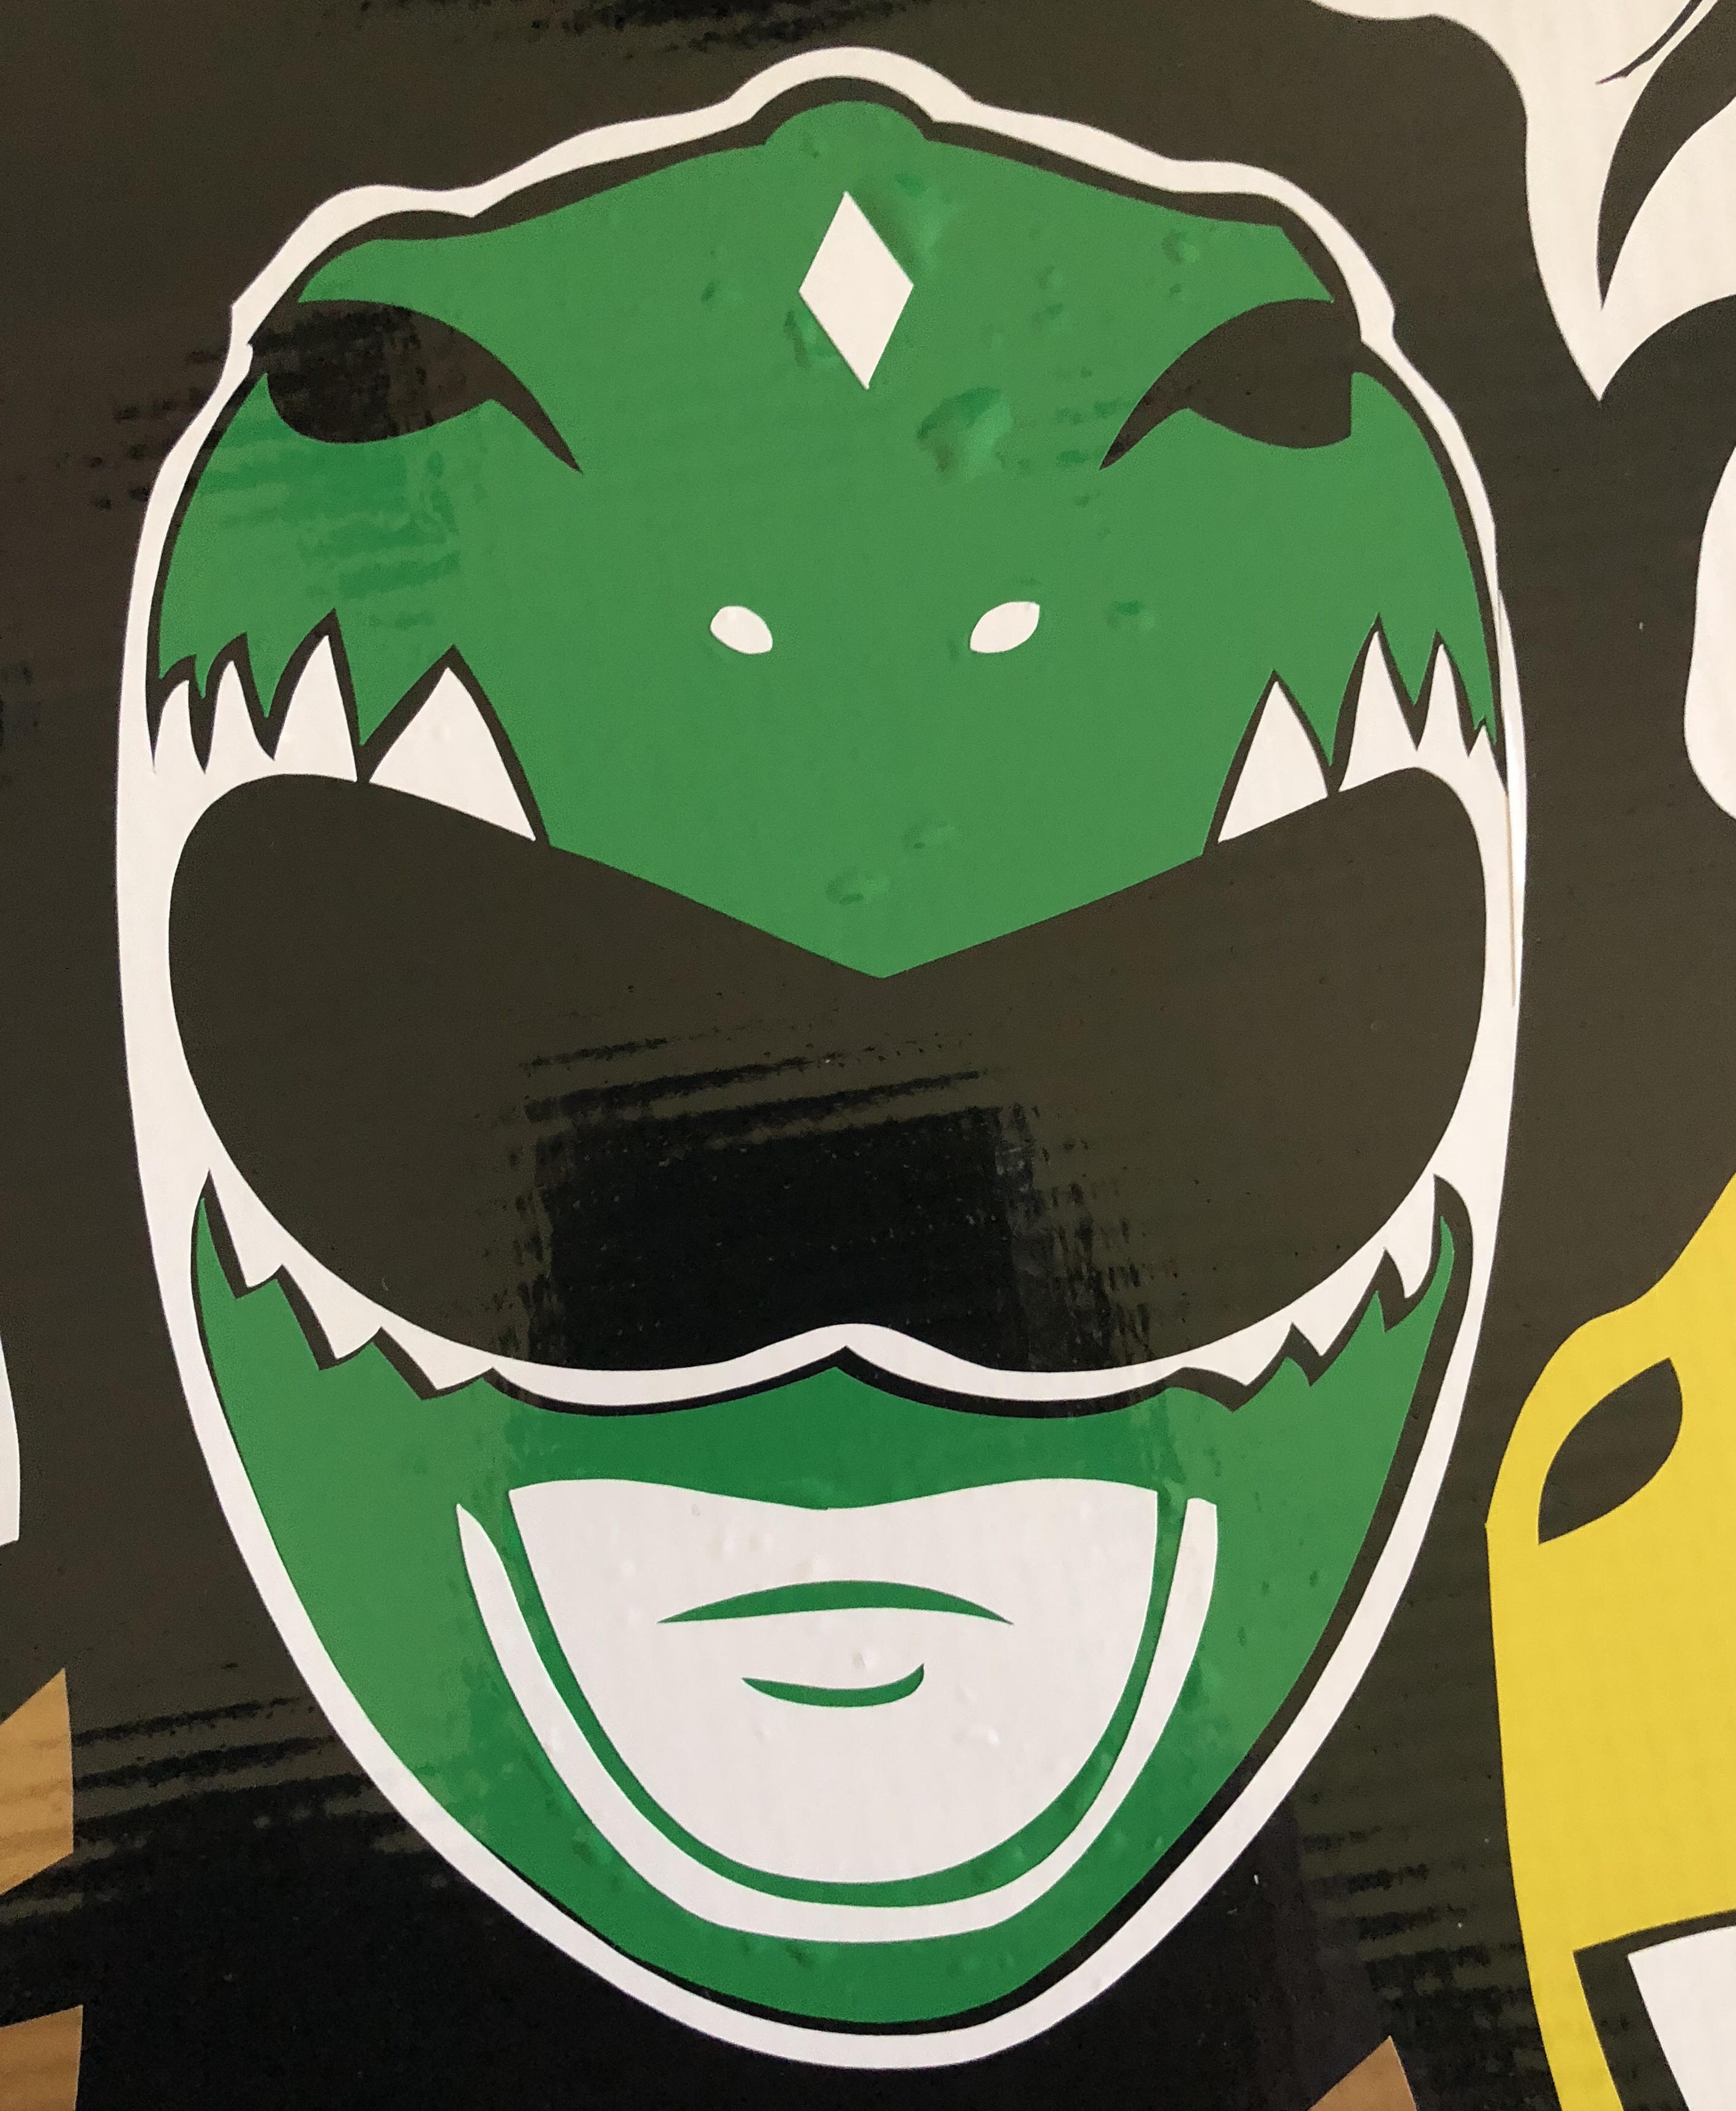 Power Rangers Green Power Ranger Helmet Vinyl Decal Bitchen Stickerz